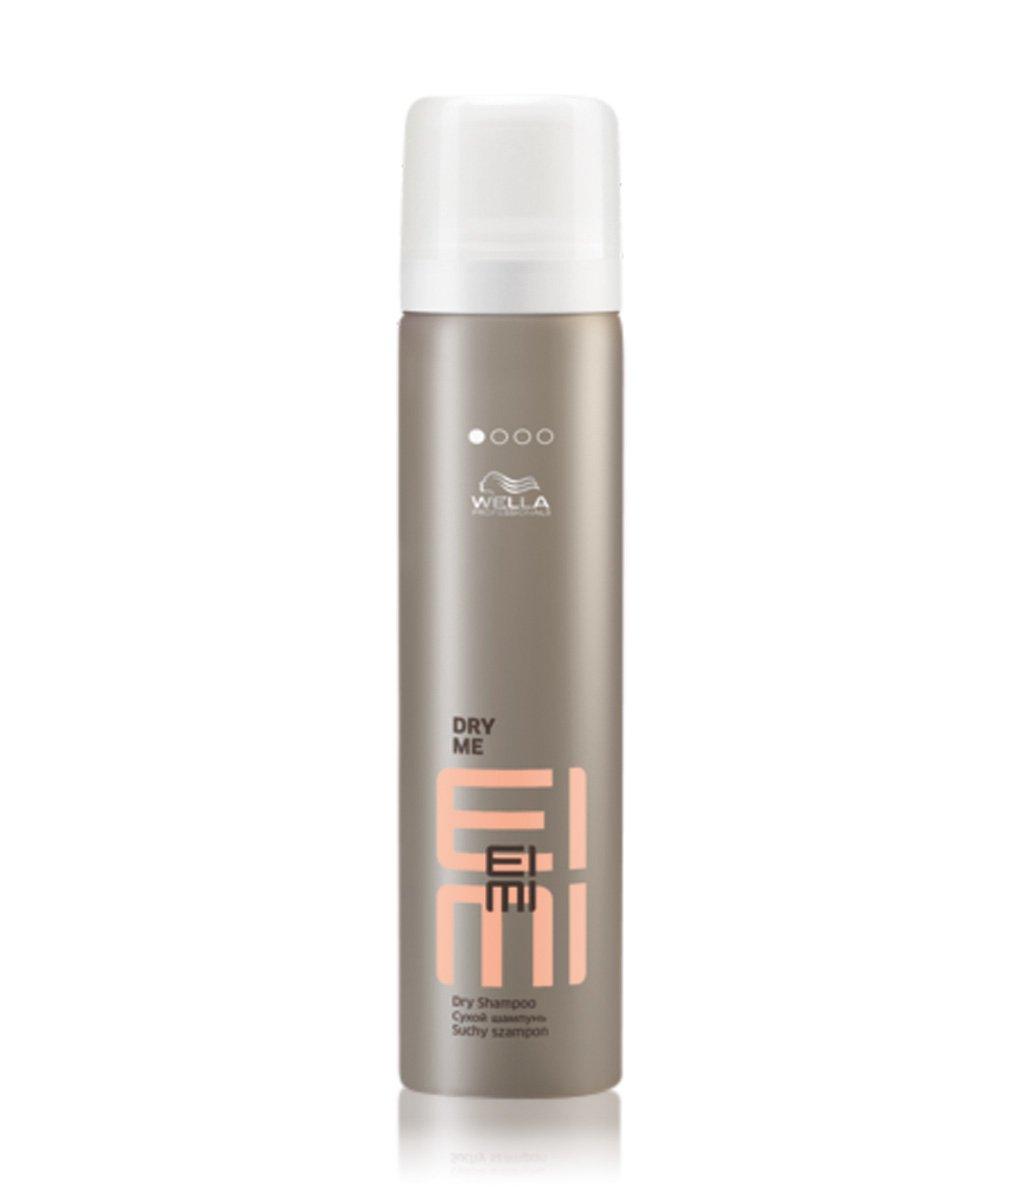 Wella EIMI Dry ME Dry Shampoo - 180ml